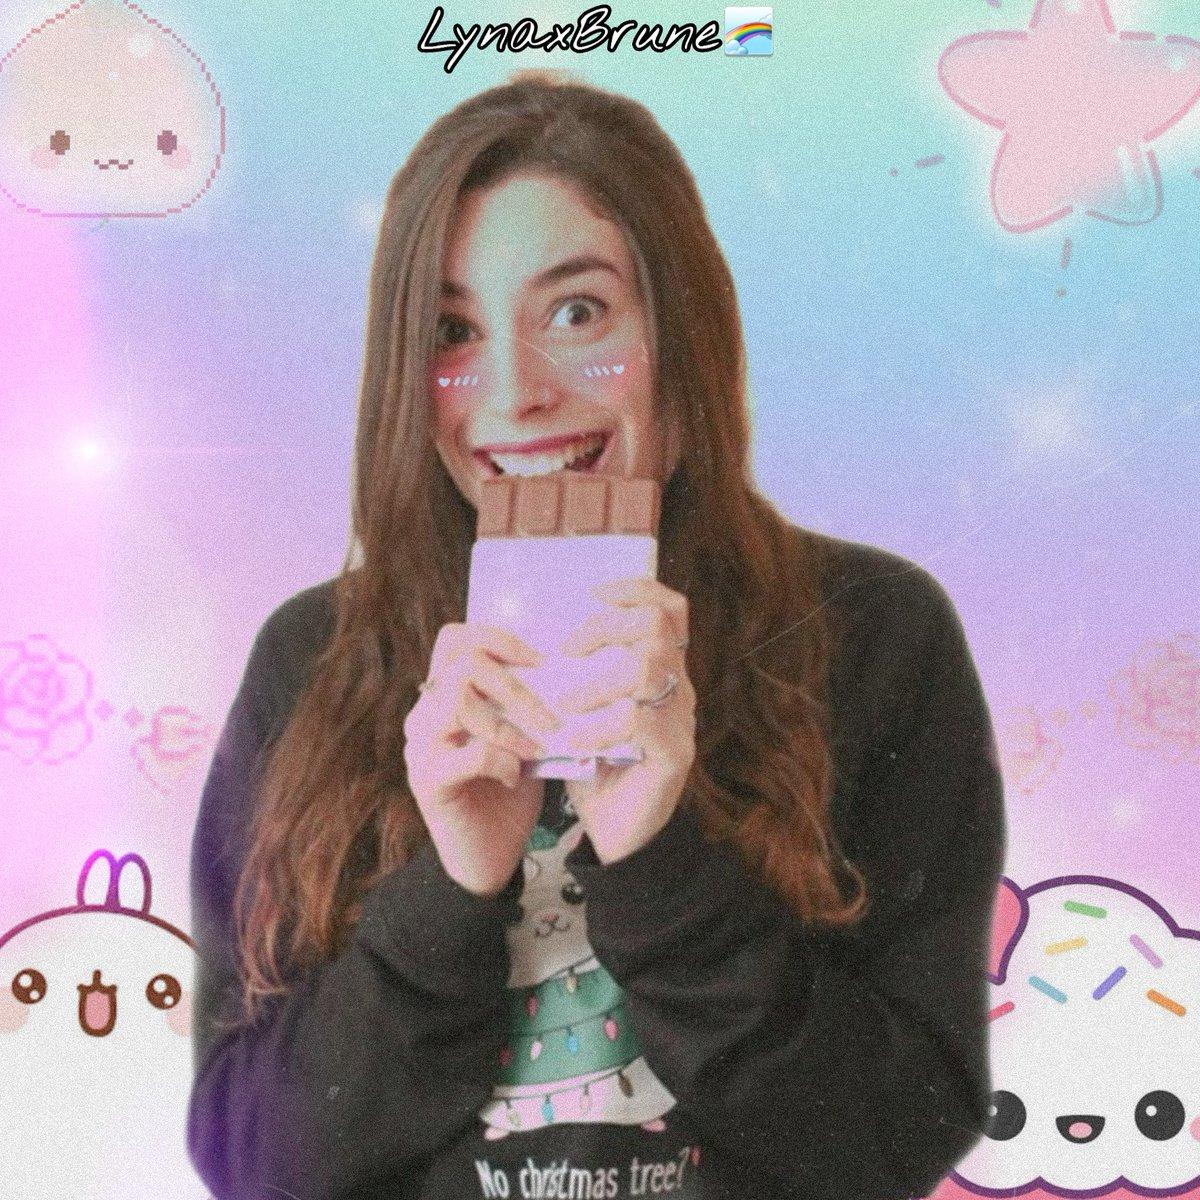 Nuevo edit@SrtaLyna @SrtaLyna @SrtaLyna #edit #lyniel #lyna #evelynvallejos pic.twitter.com/rm4UBNVhV5